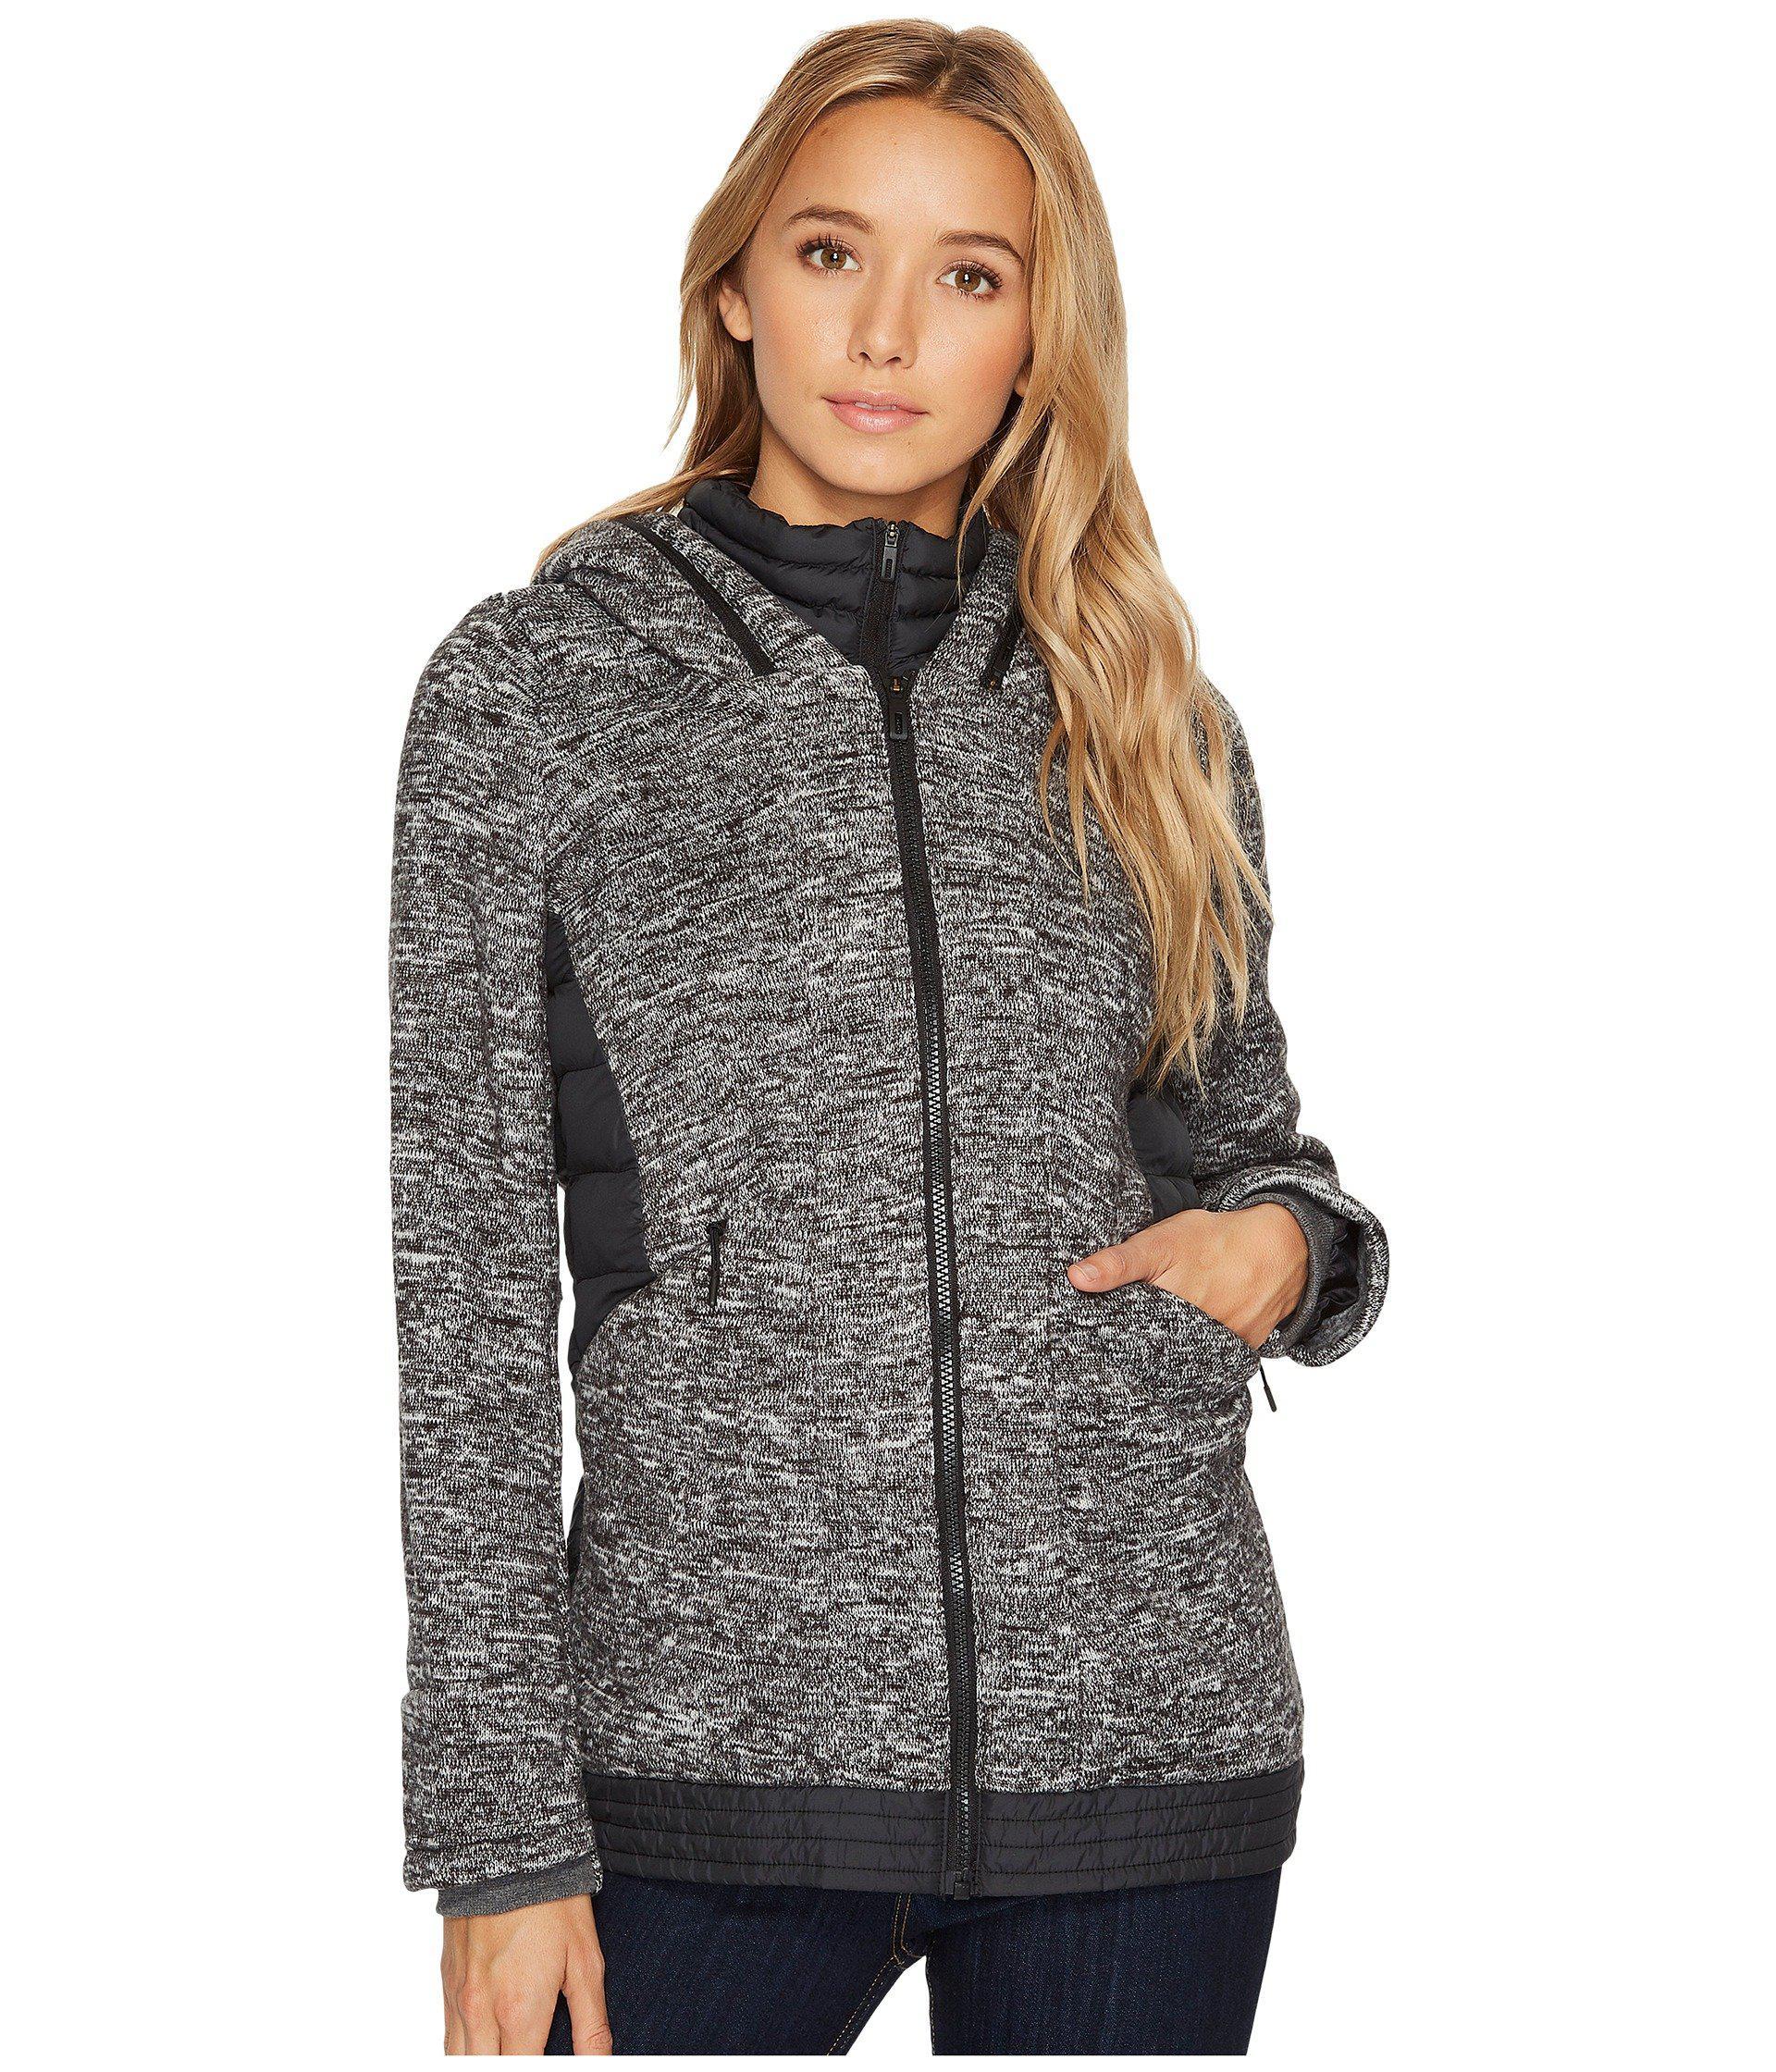 78130616d Women's Gray Nuvic Hybrid Jacket 2